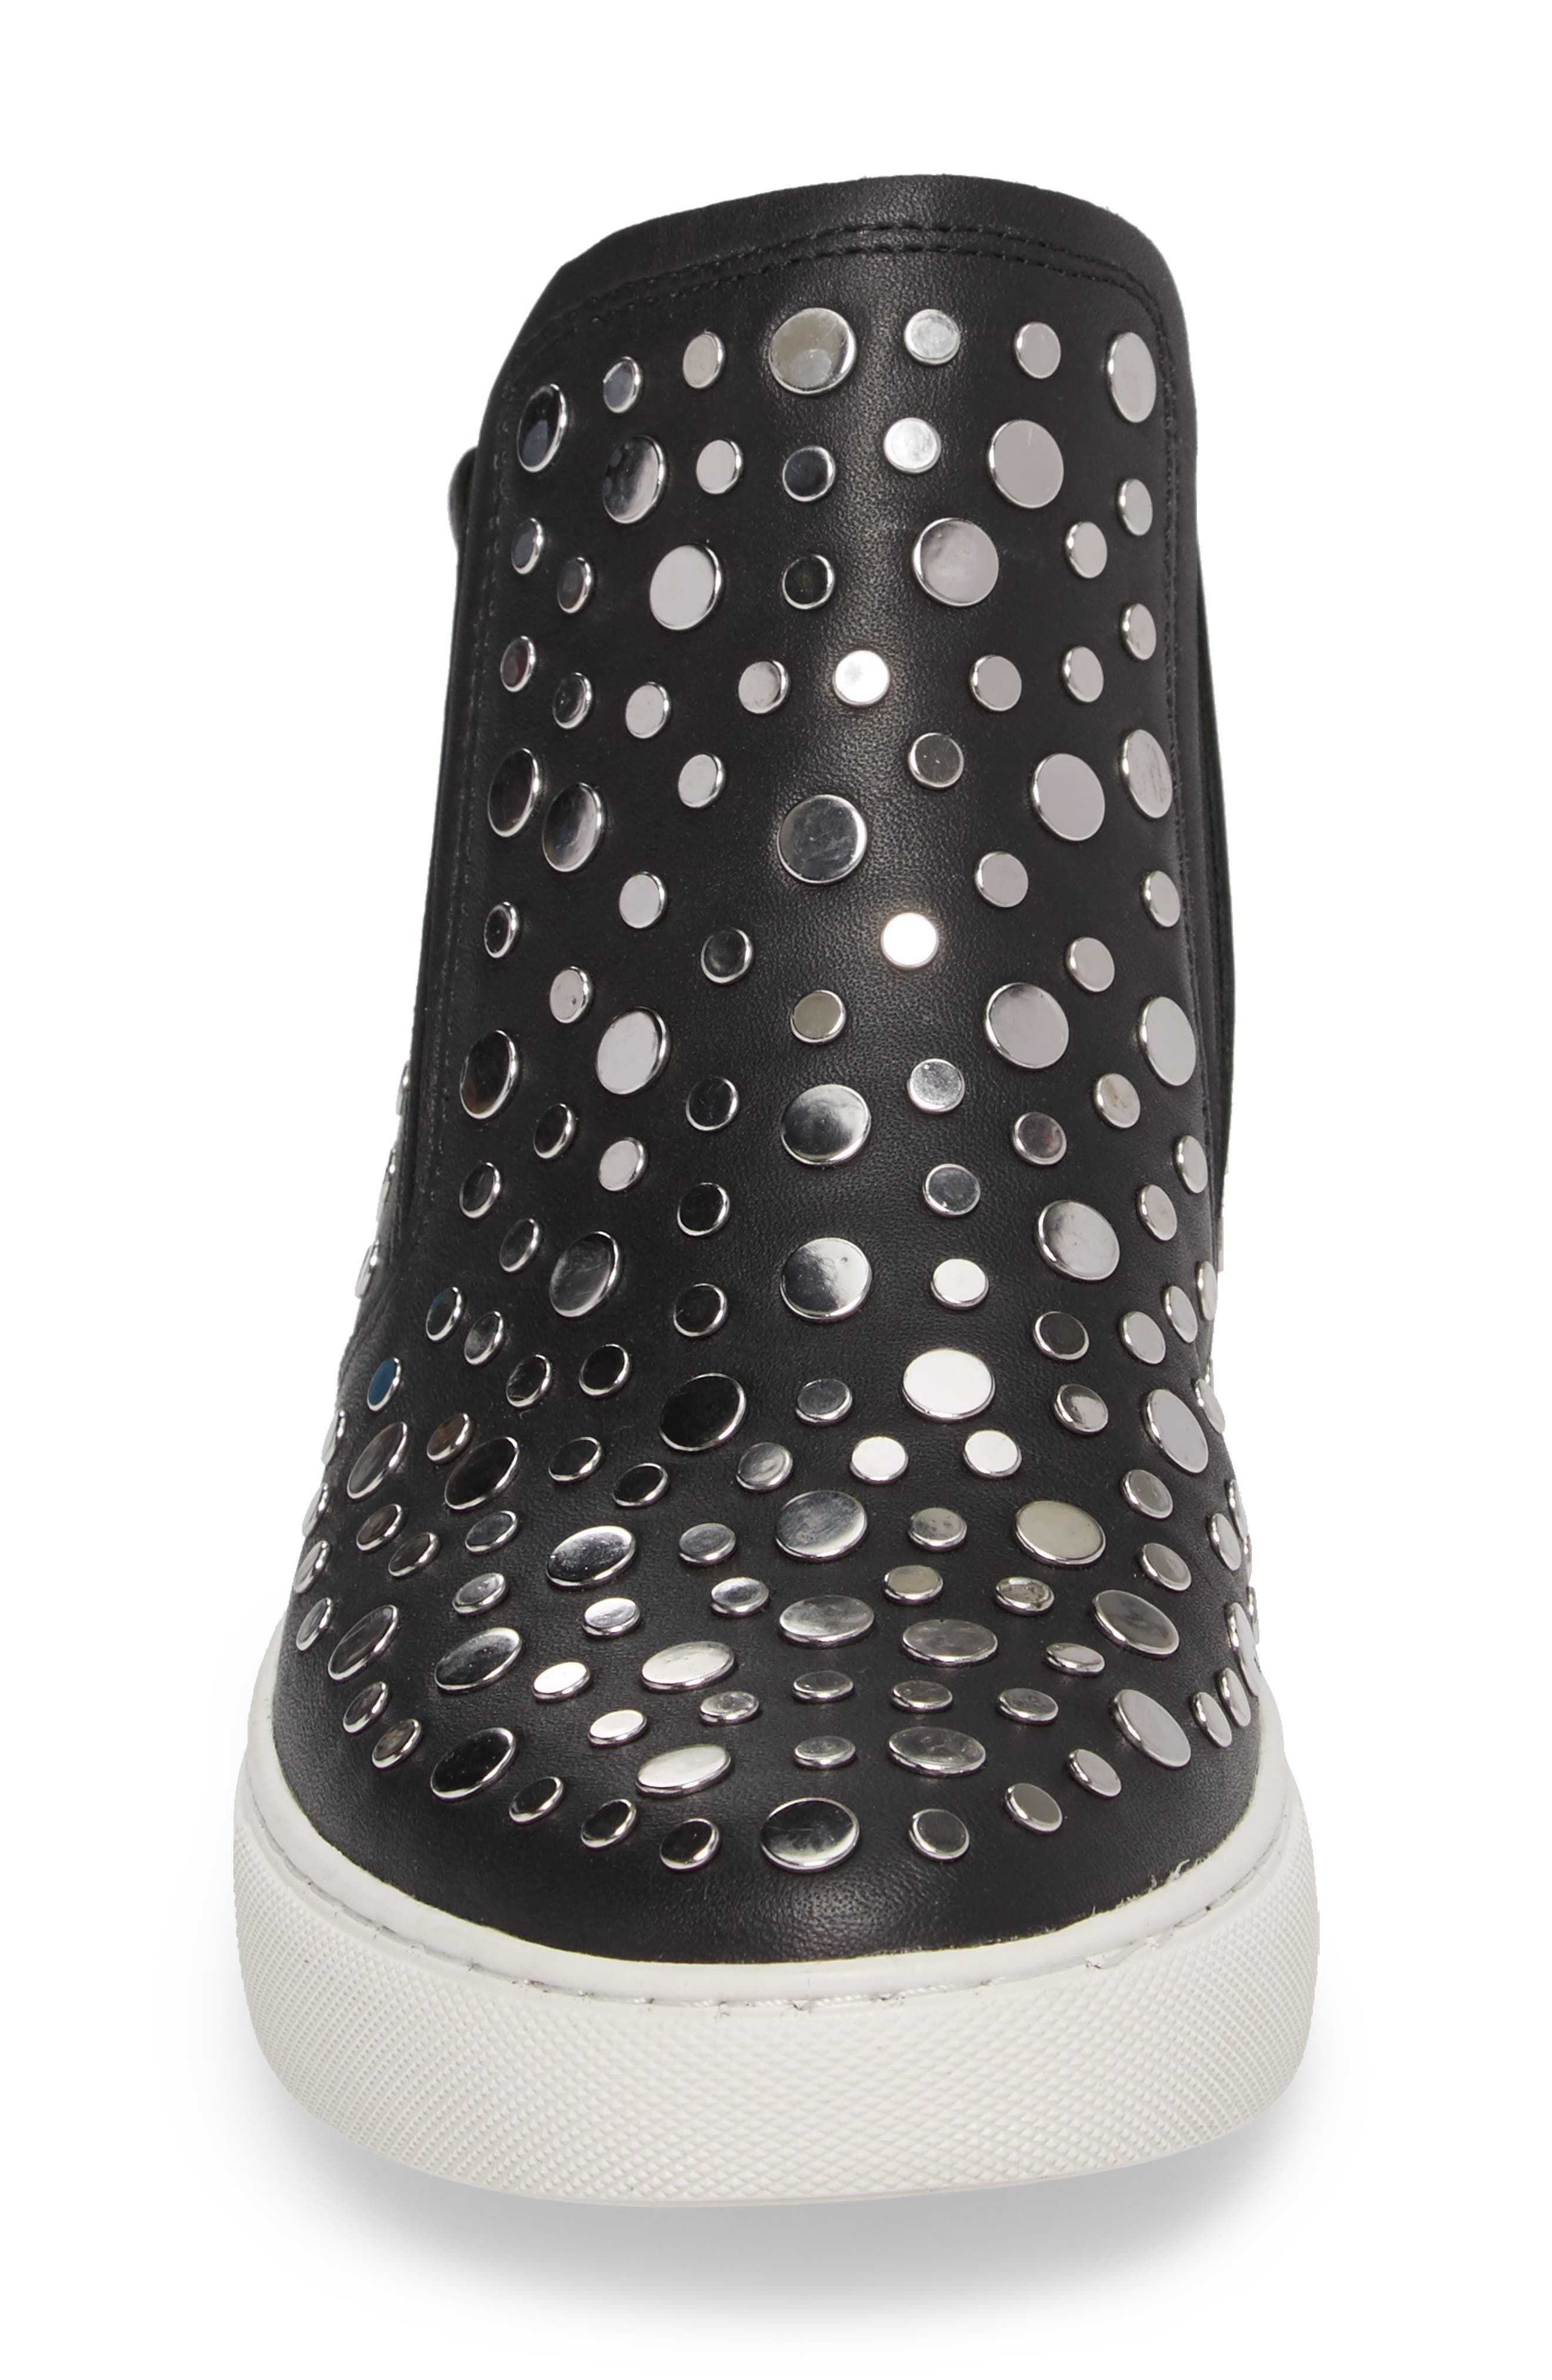 Kalvin Studded High Top Sneaker,                             Alternate thumbnail 4, color,                             Black Leather